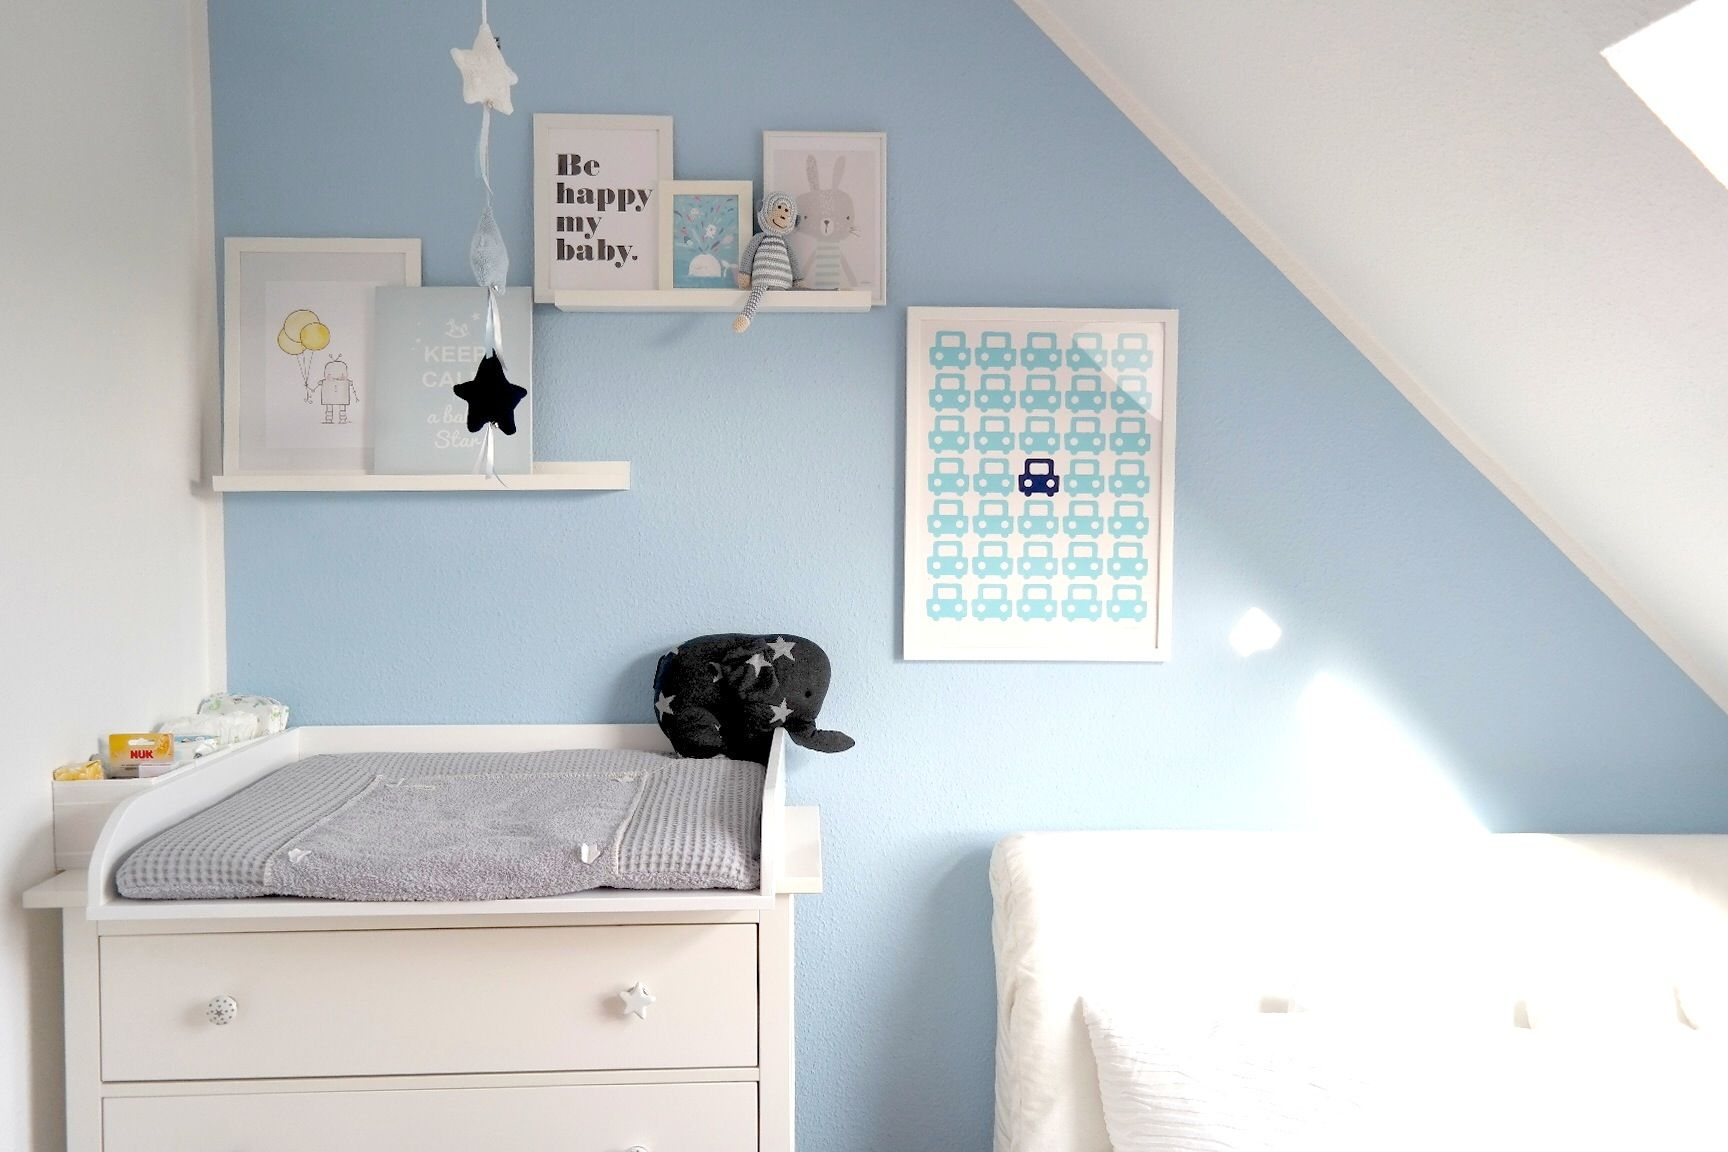 Babyzimmer Bilder Collage Wand Elefant Mobilee Baby's Only Ikea ... Ikea Online Babyzimmer